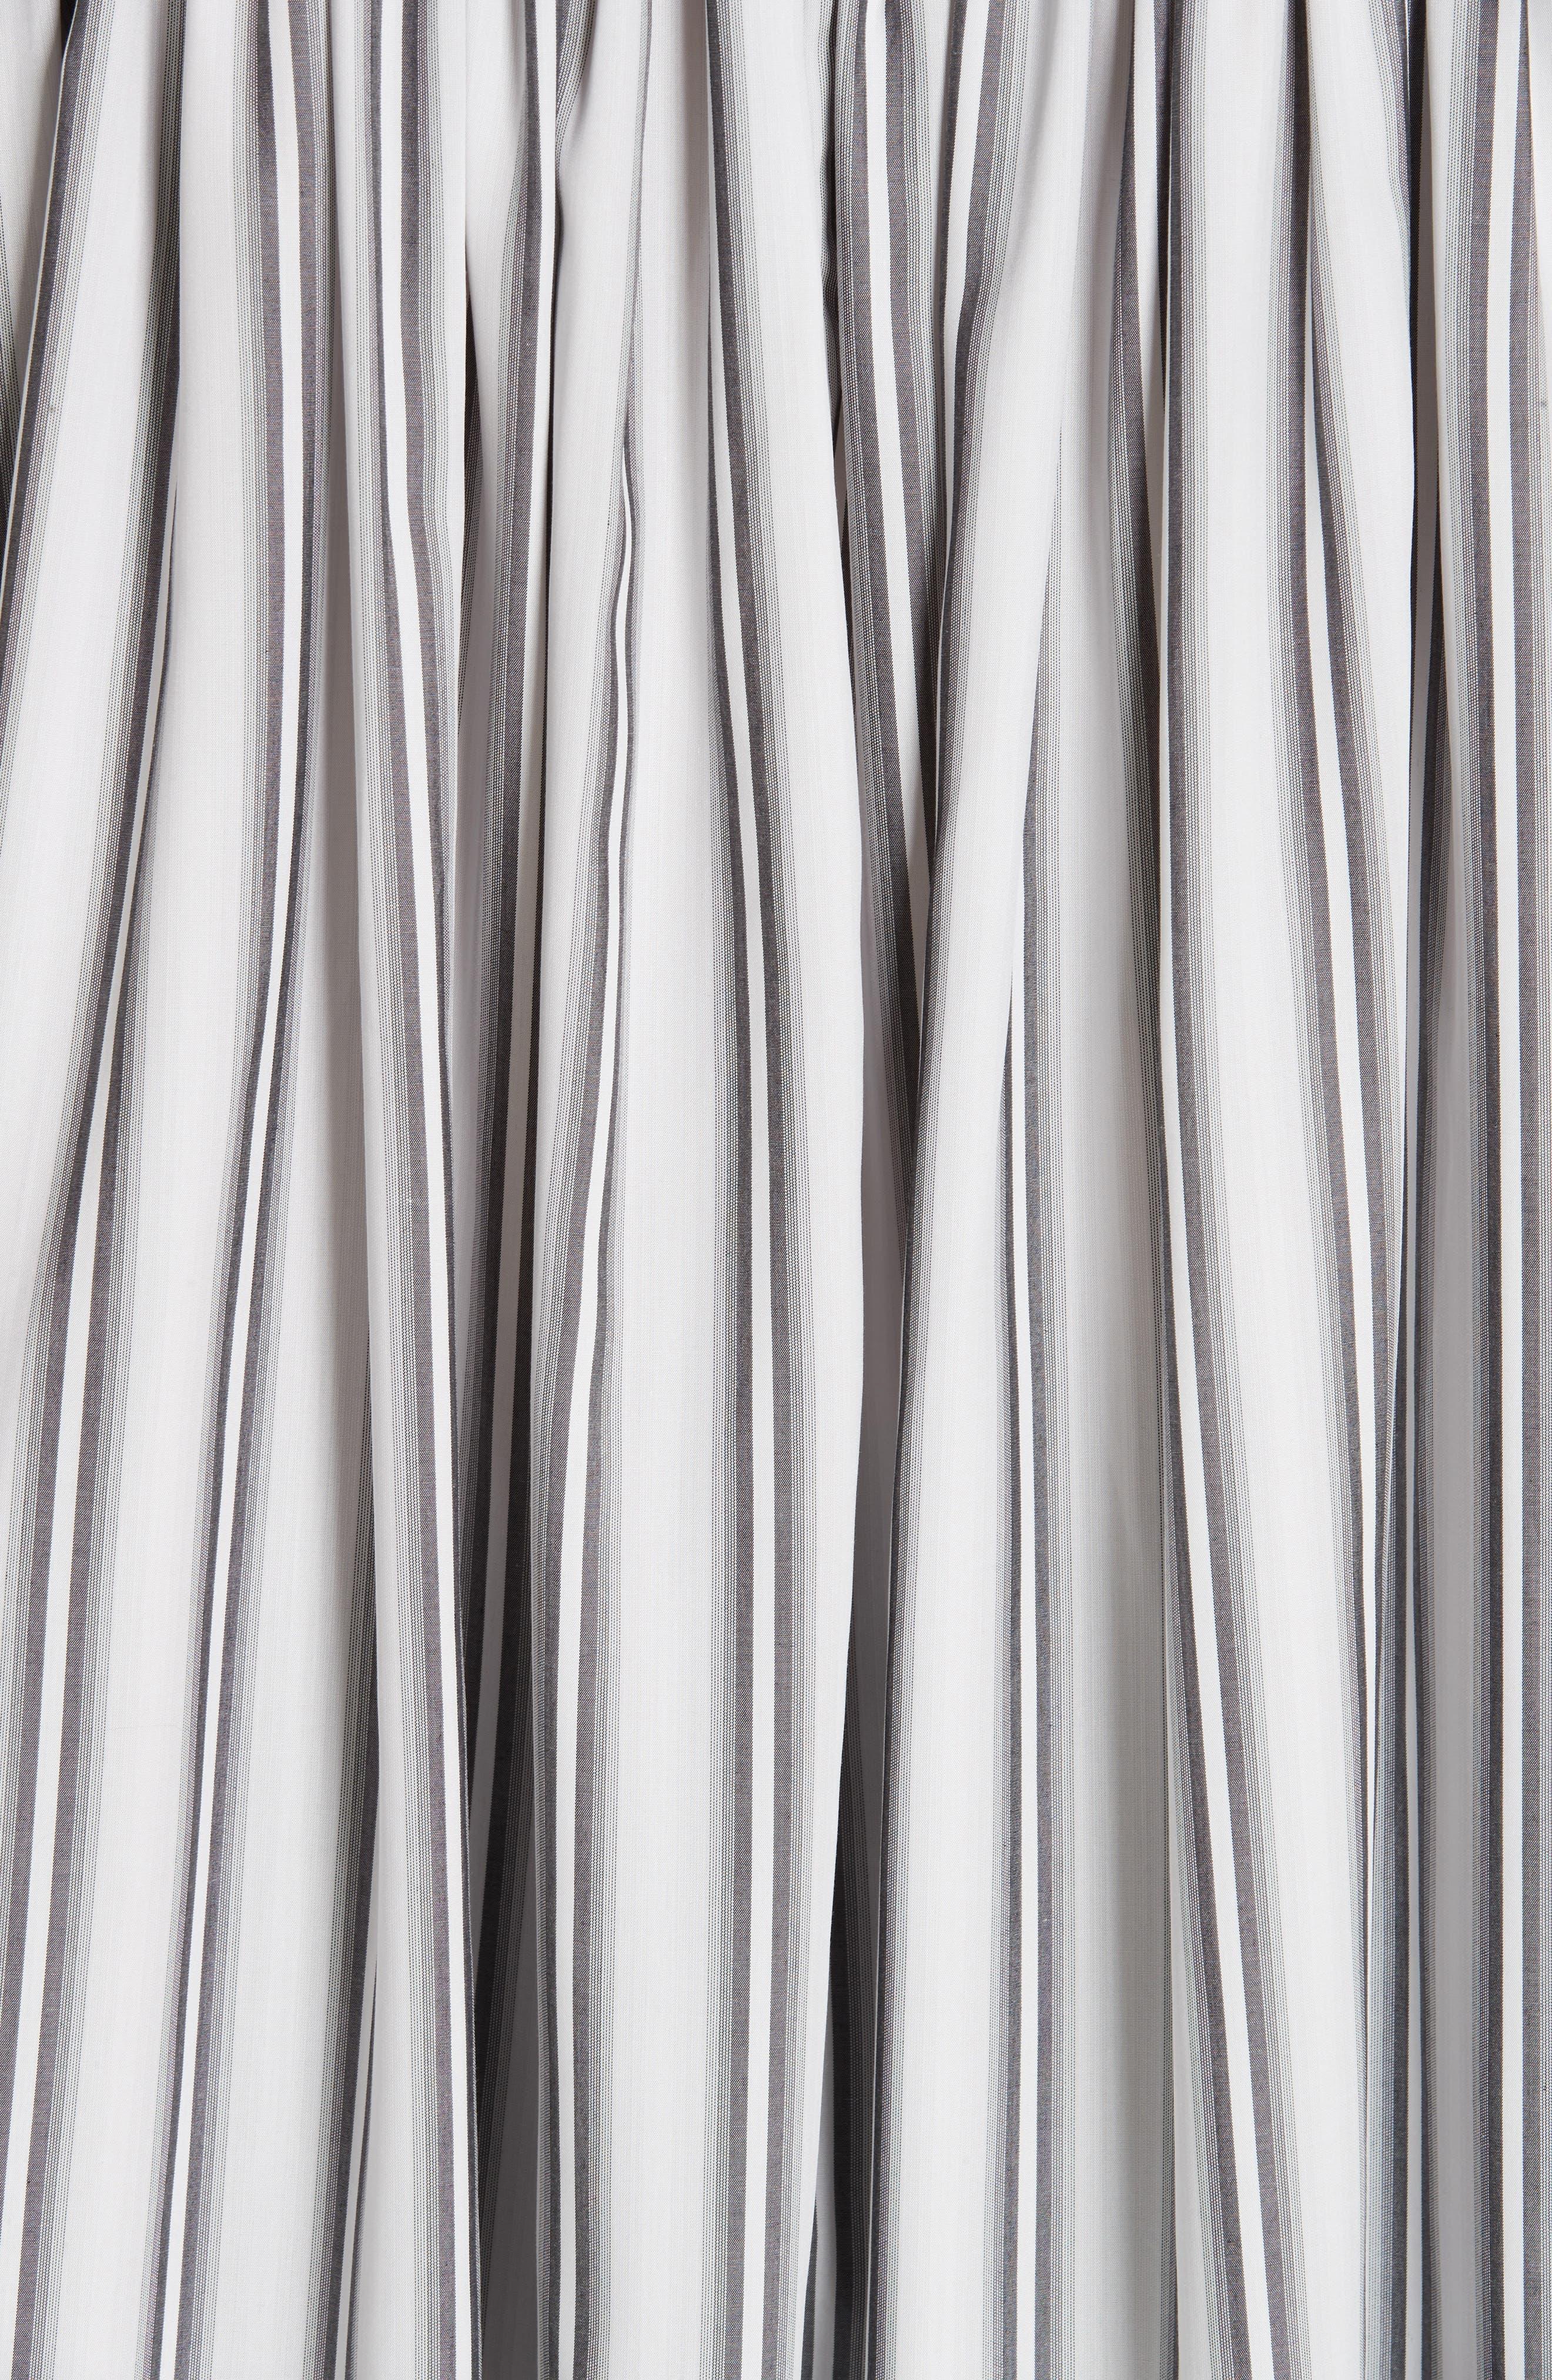 PALMER/HARDING, Streep Stripe Shirt, Alternate thumbnail 5, color, GRADIENT STRIPE WITH BLACK